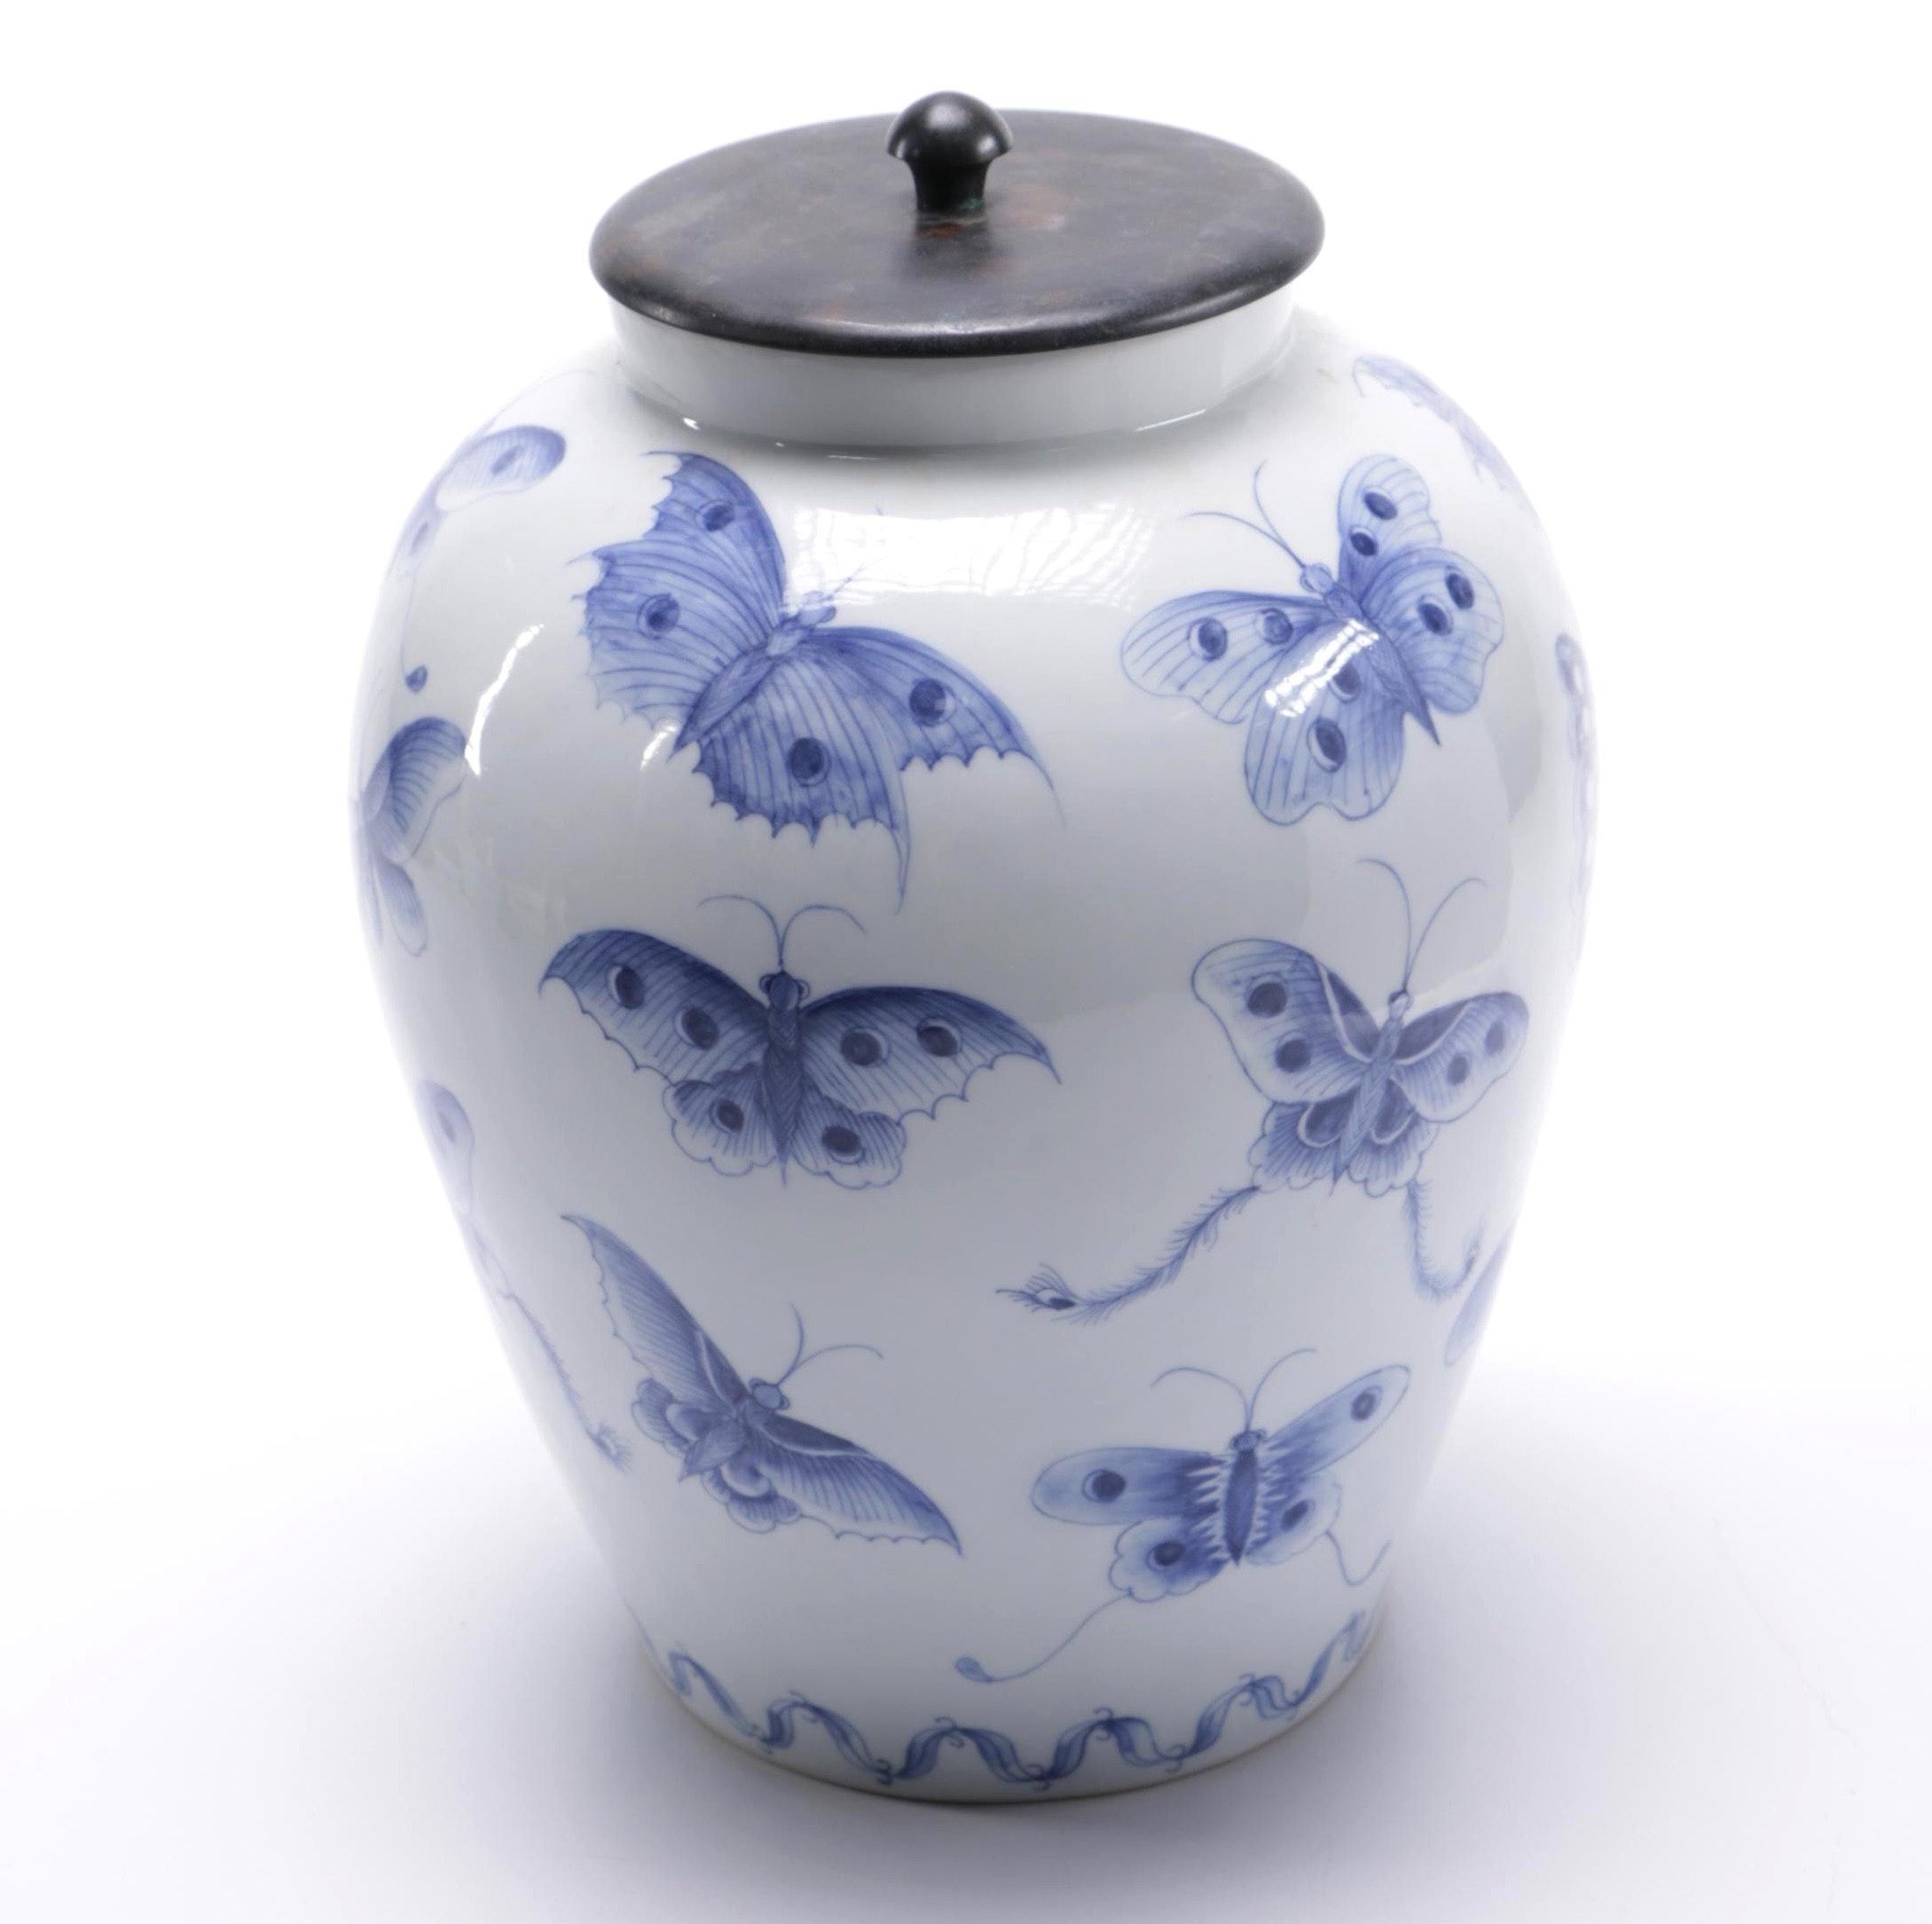 Ceramic Lidded Urn